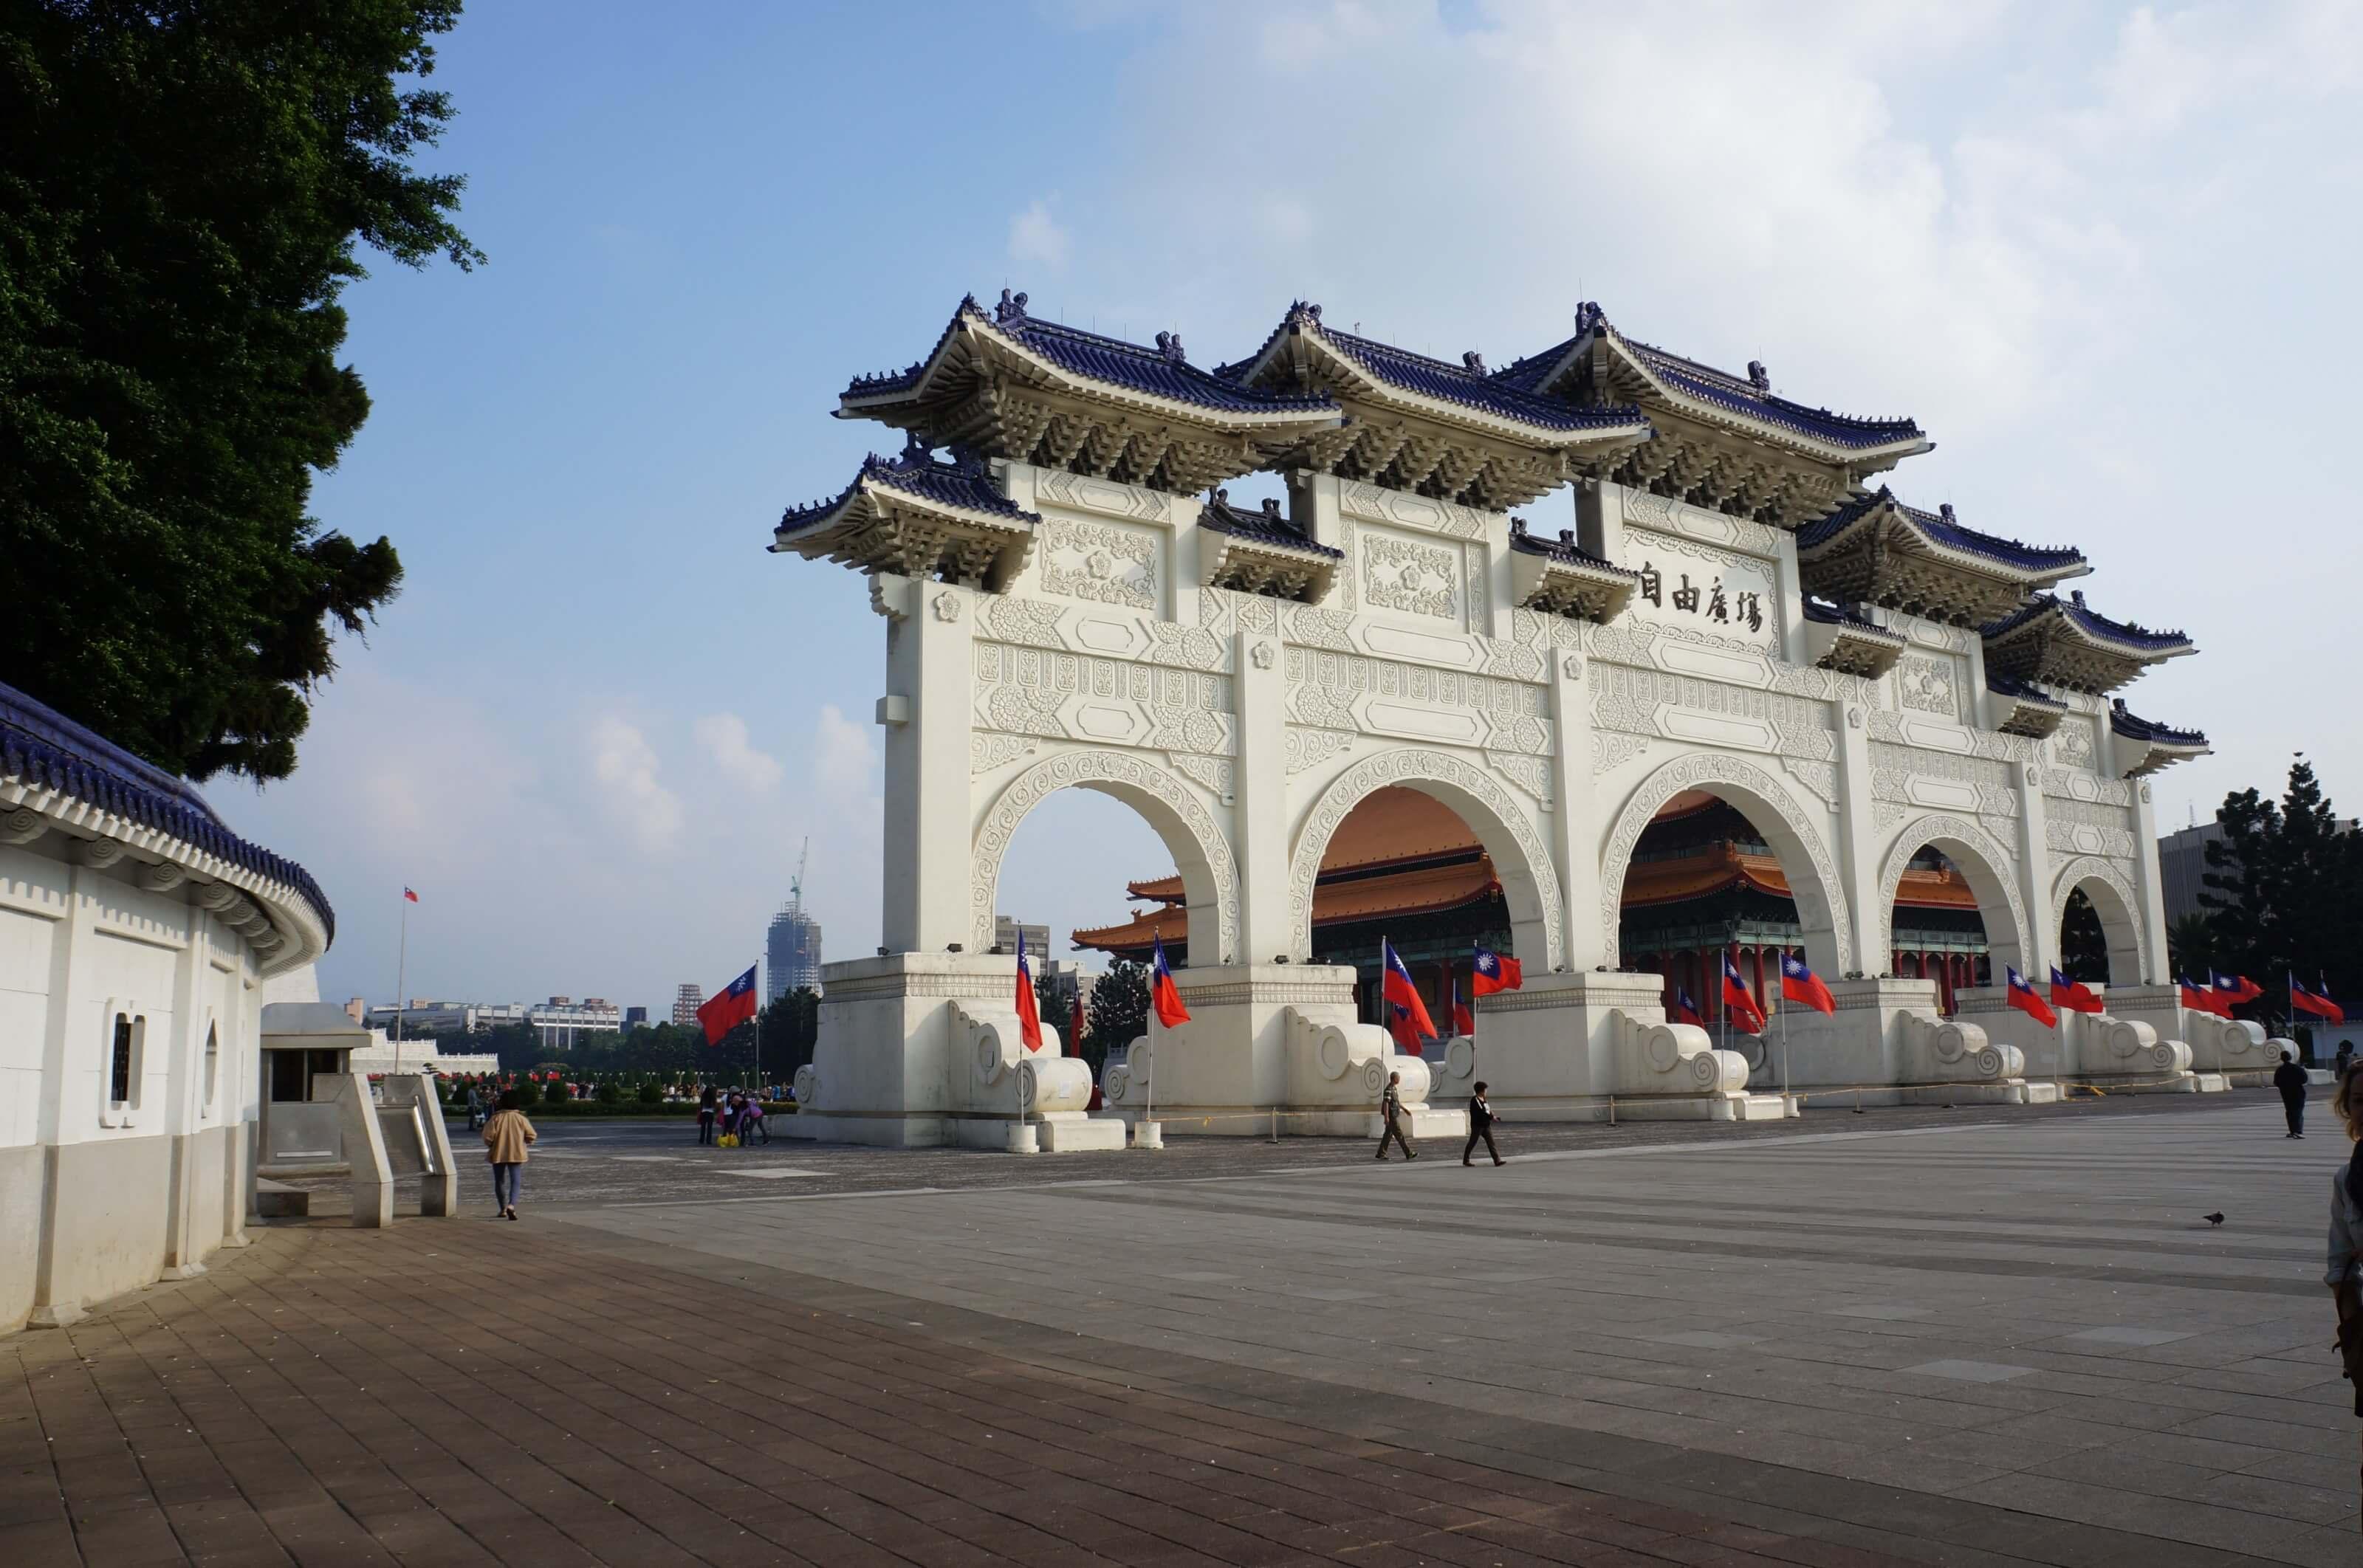 taipei capital of taiwan